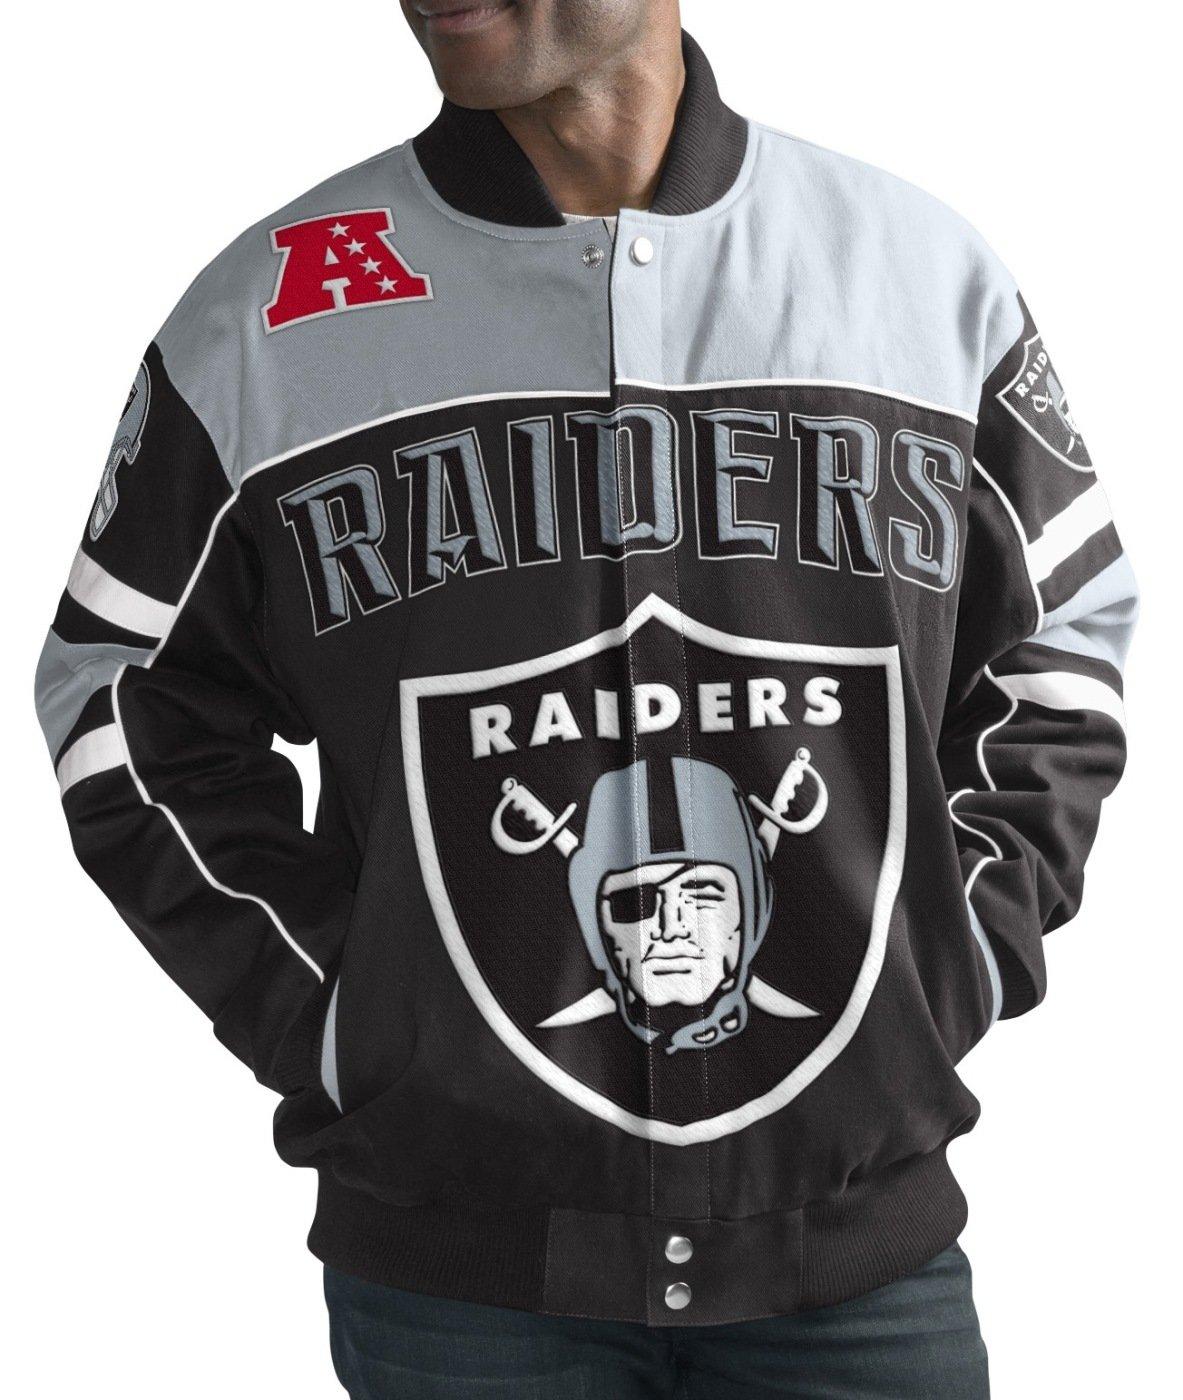 Oakland RaidersメンズNFL g-iii「Blitz」プレミアムコットンツイルジャケット Medium  B073SCF8KF